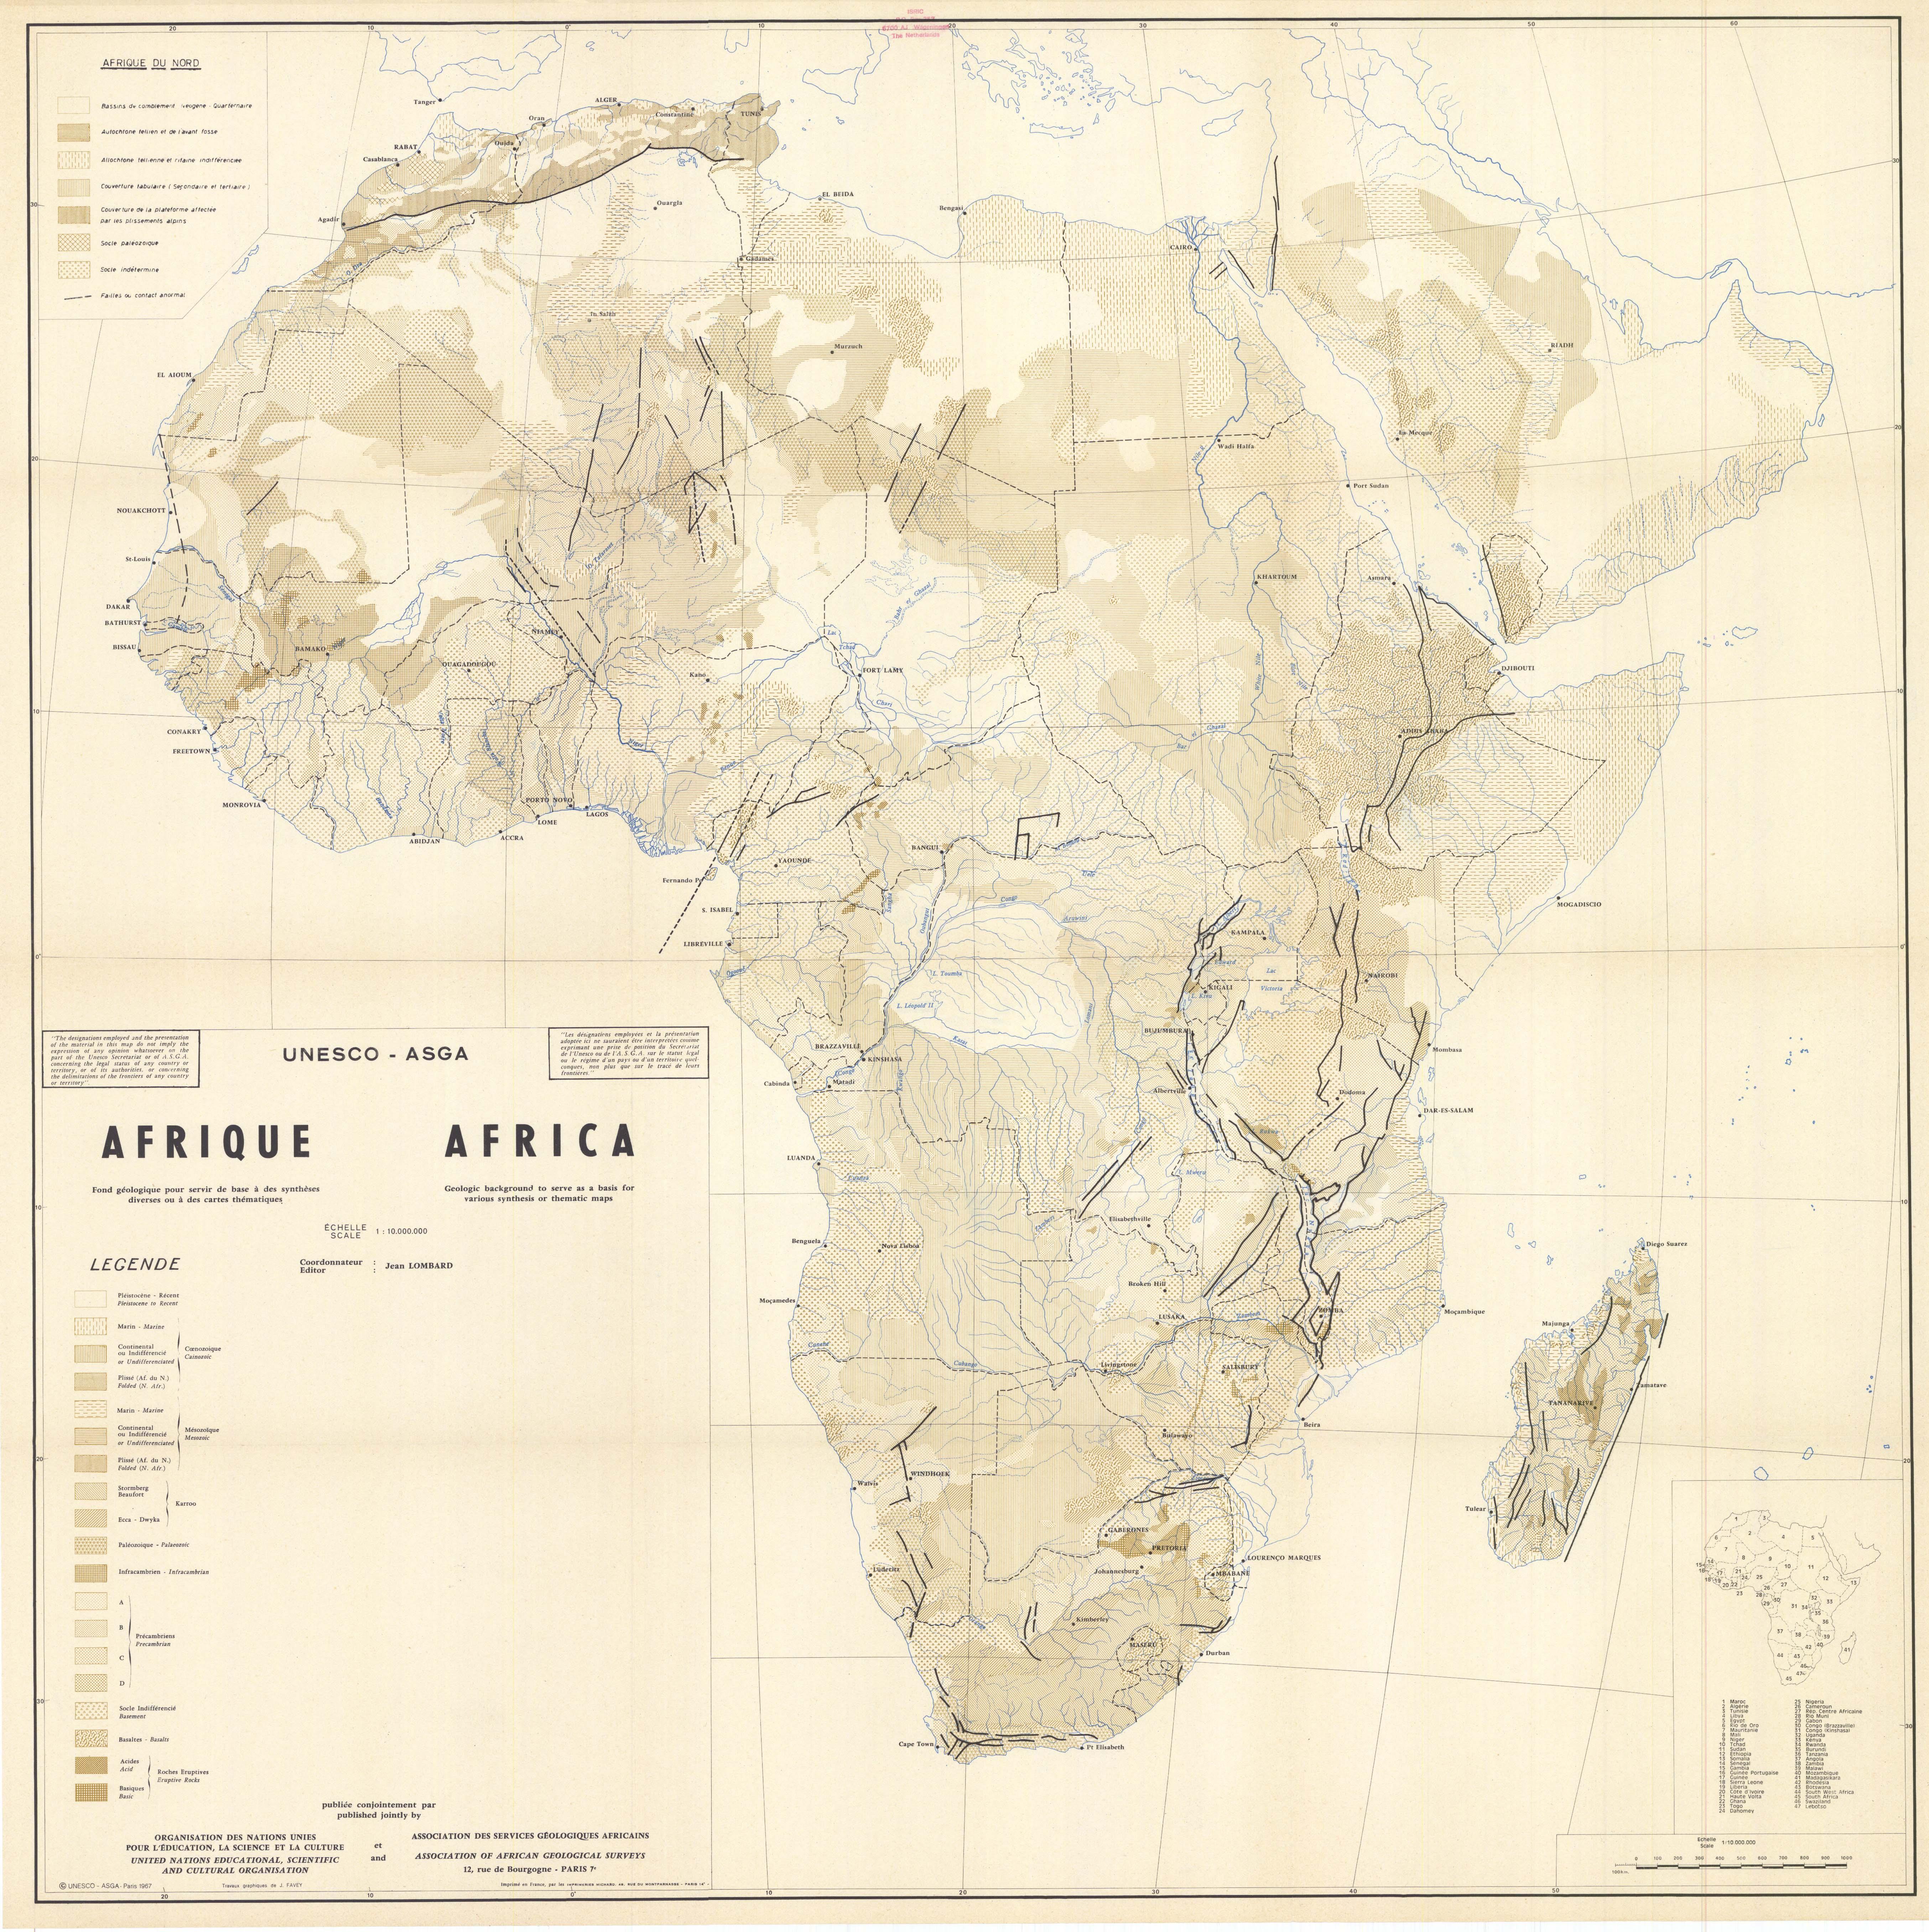 Mapa geológico de África 1967